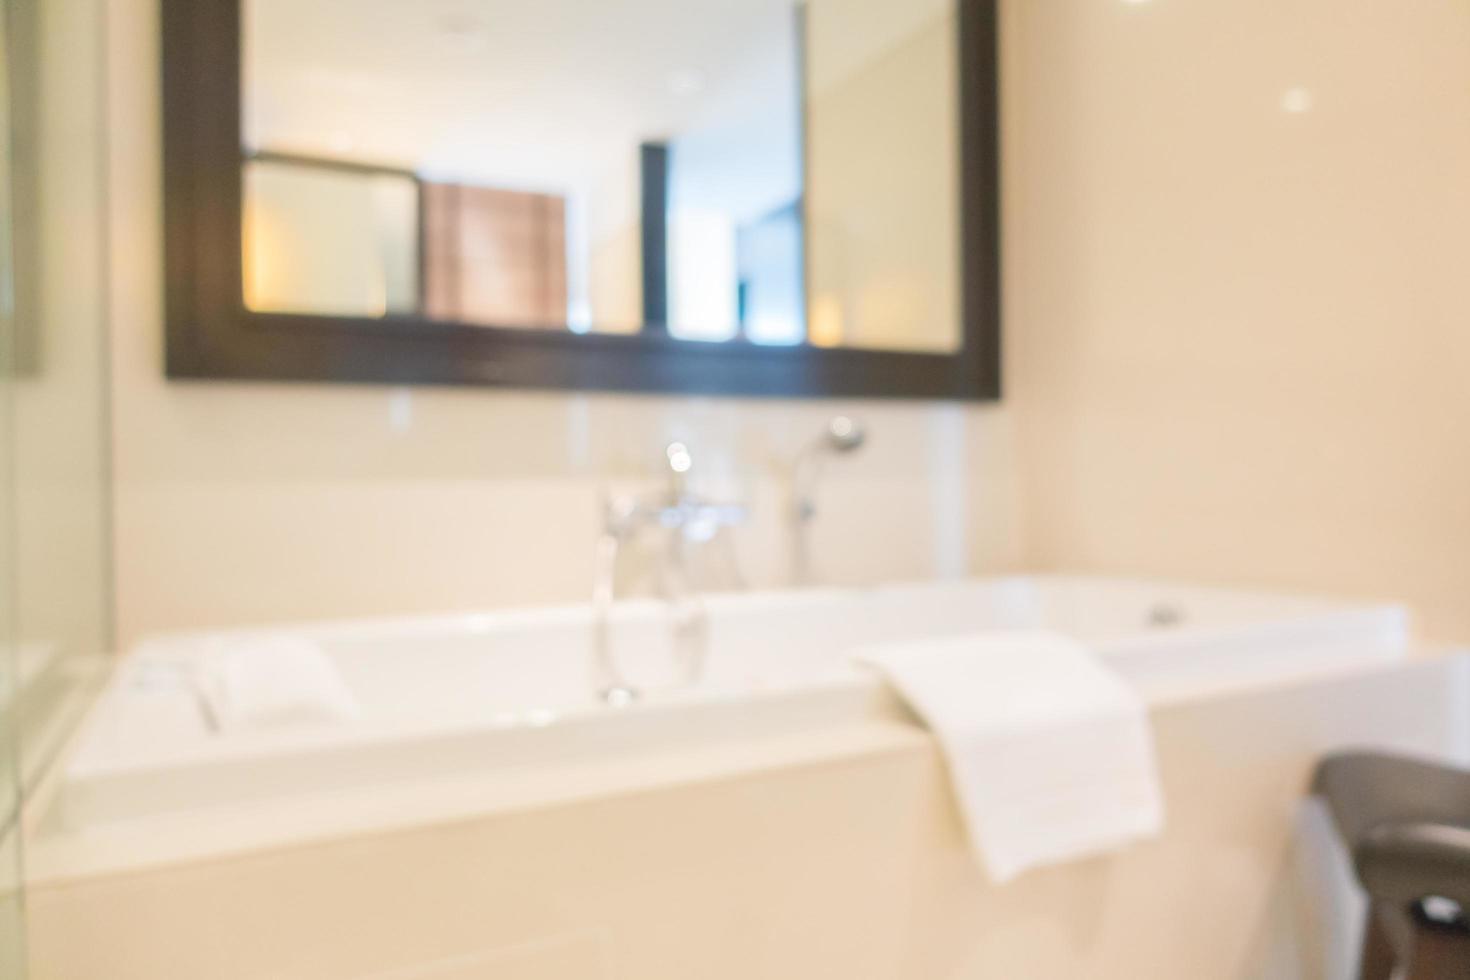 abstracte intreepupil badkamer en toilet achtergrond foto